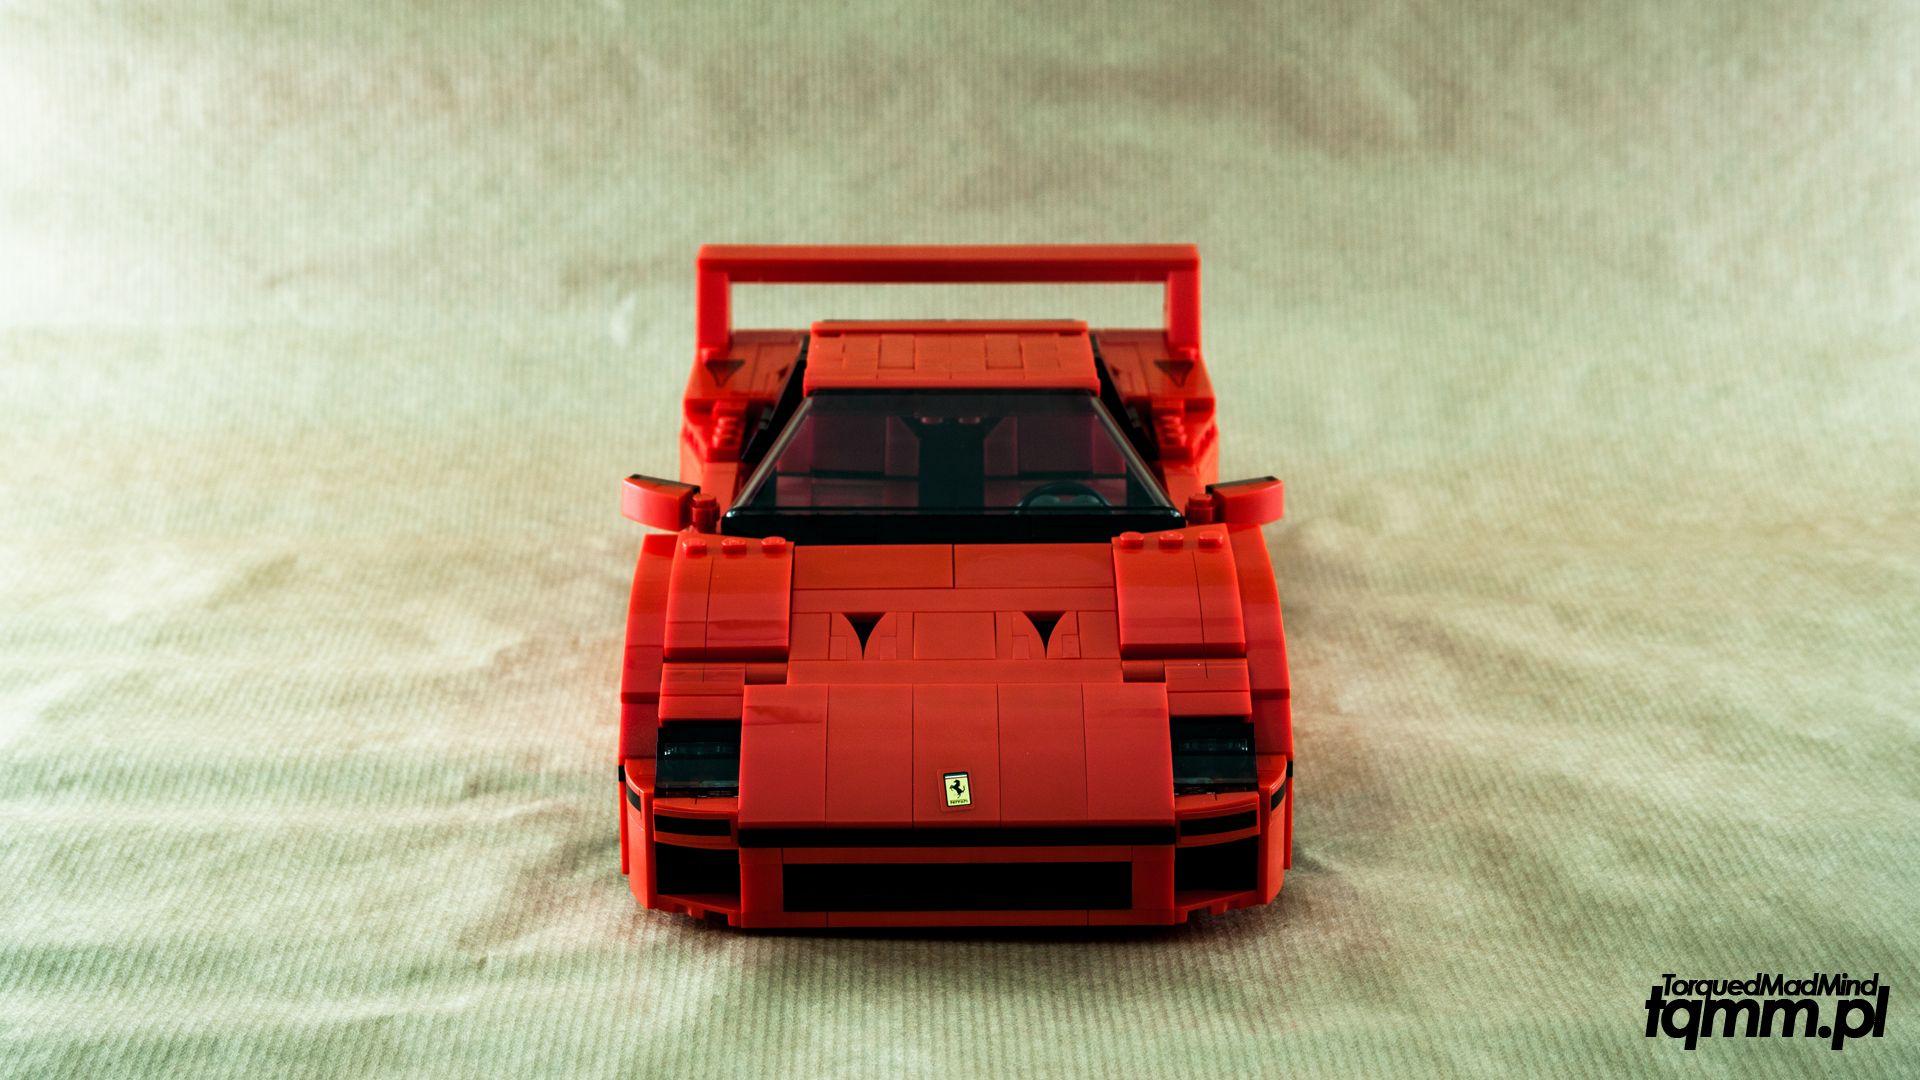 Fotki #82: LEGO Ferrari F40 10248